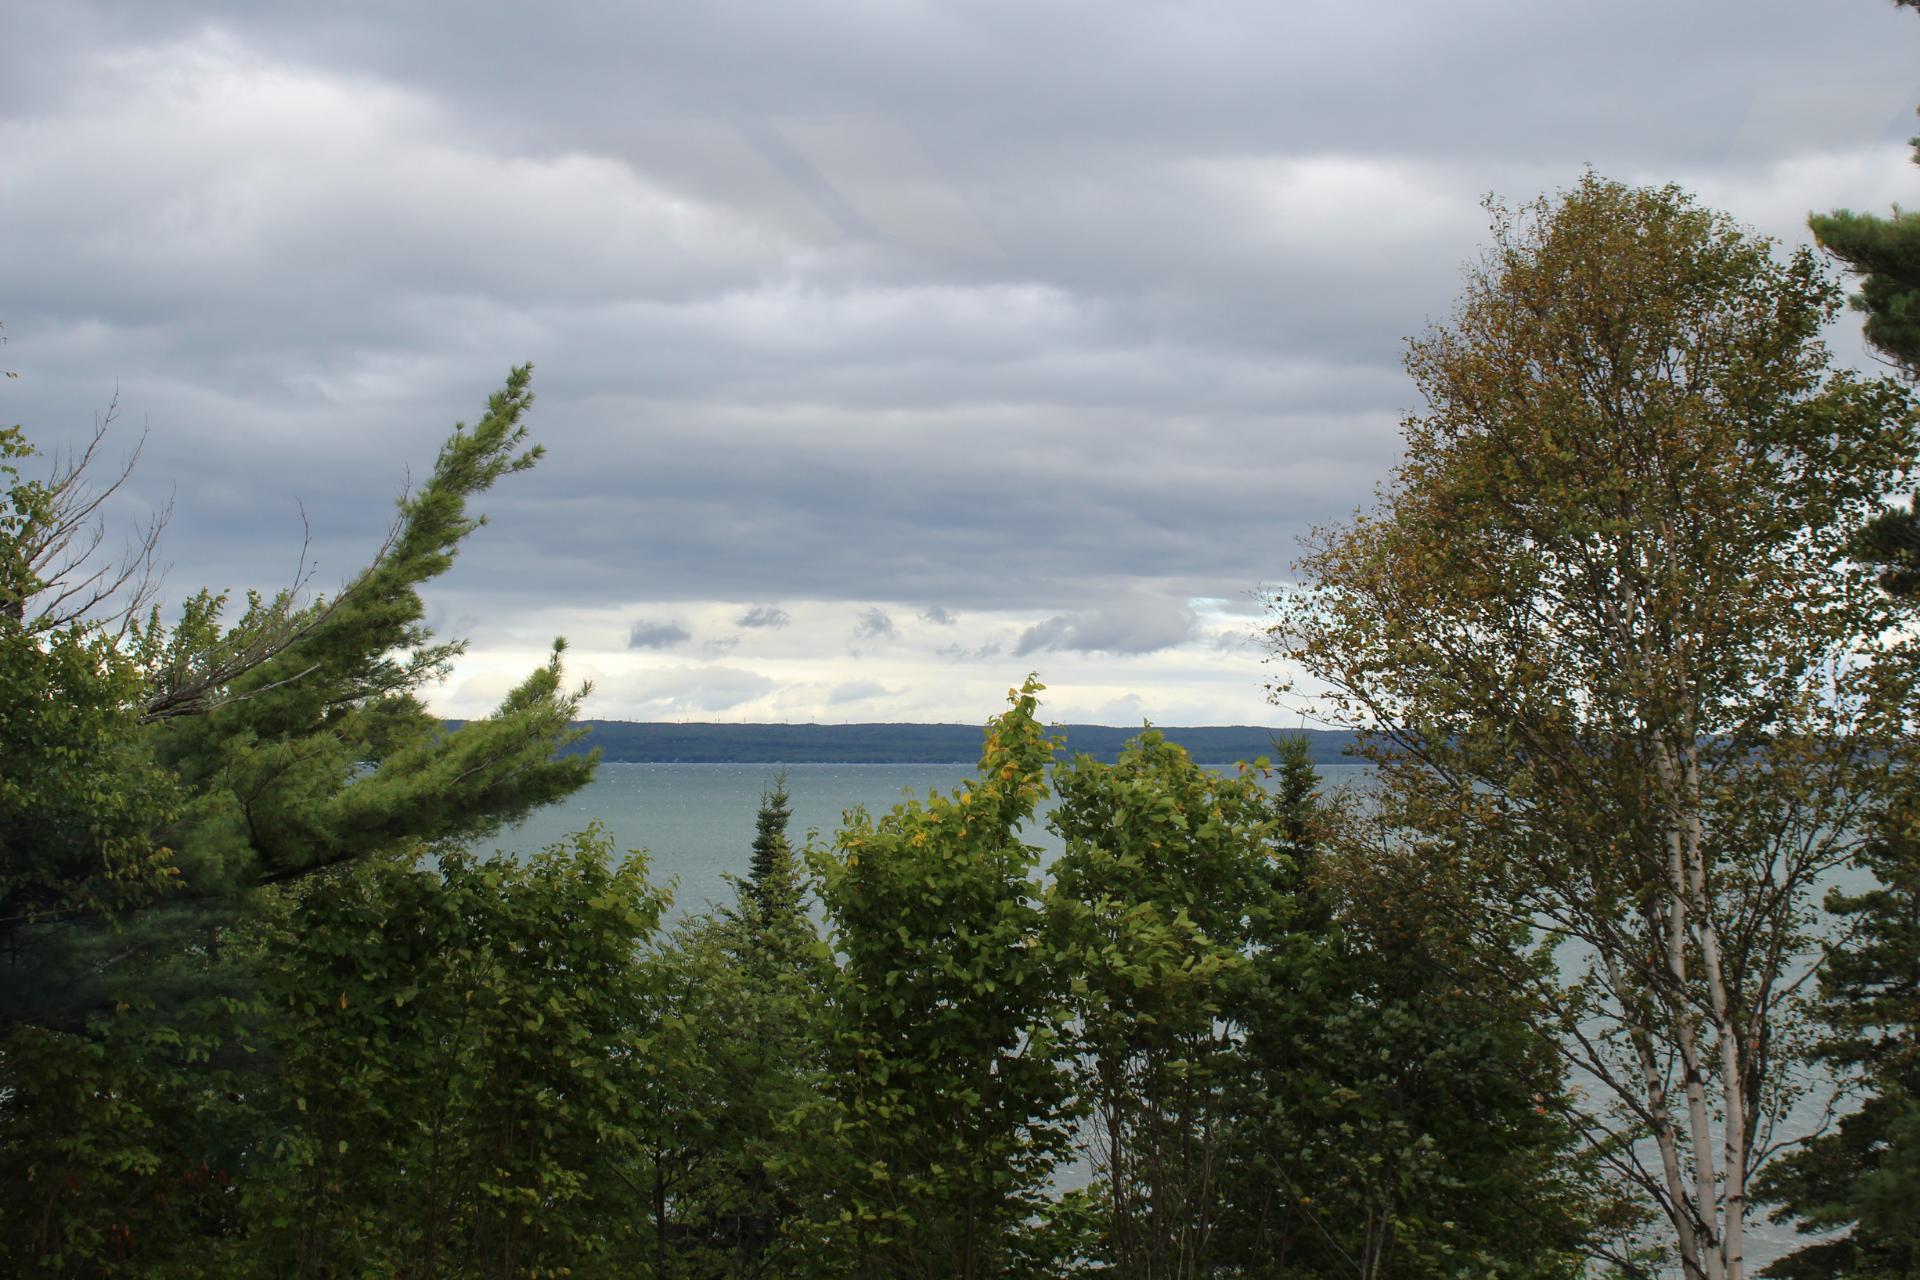 A photo of scenic Lake Superior.